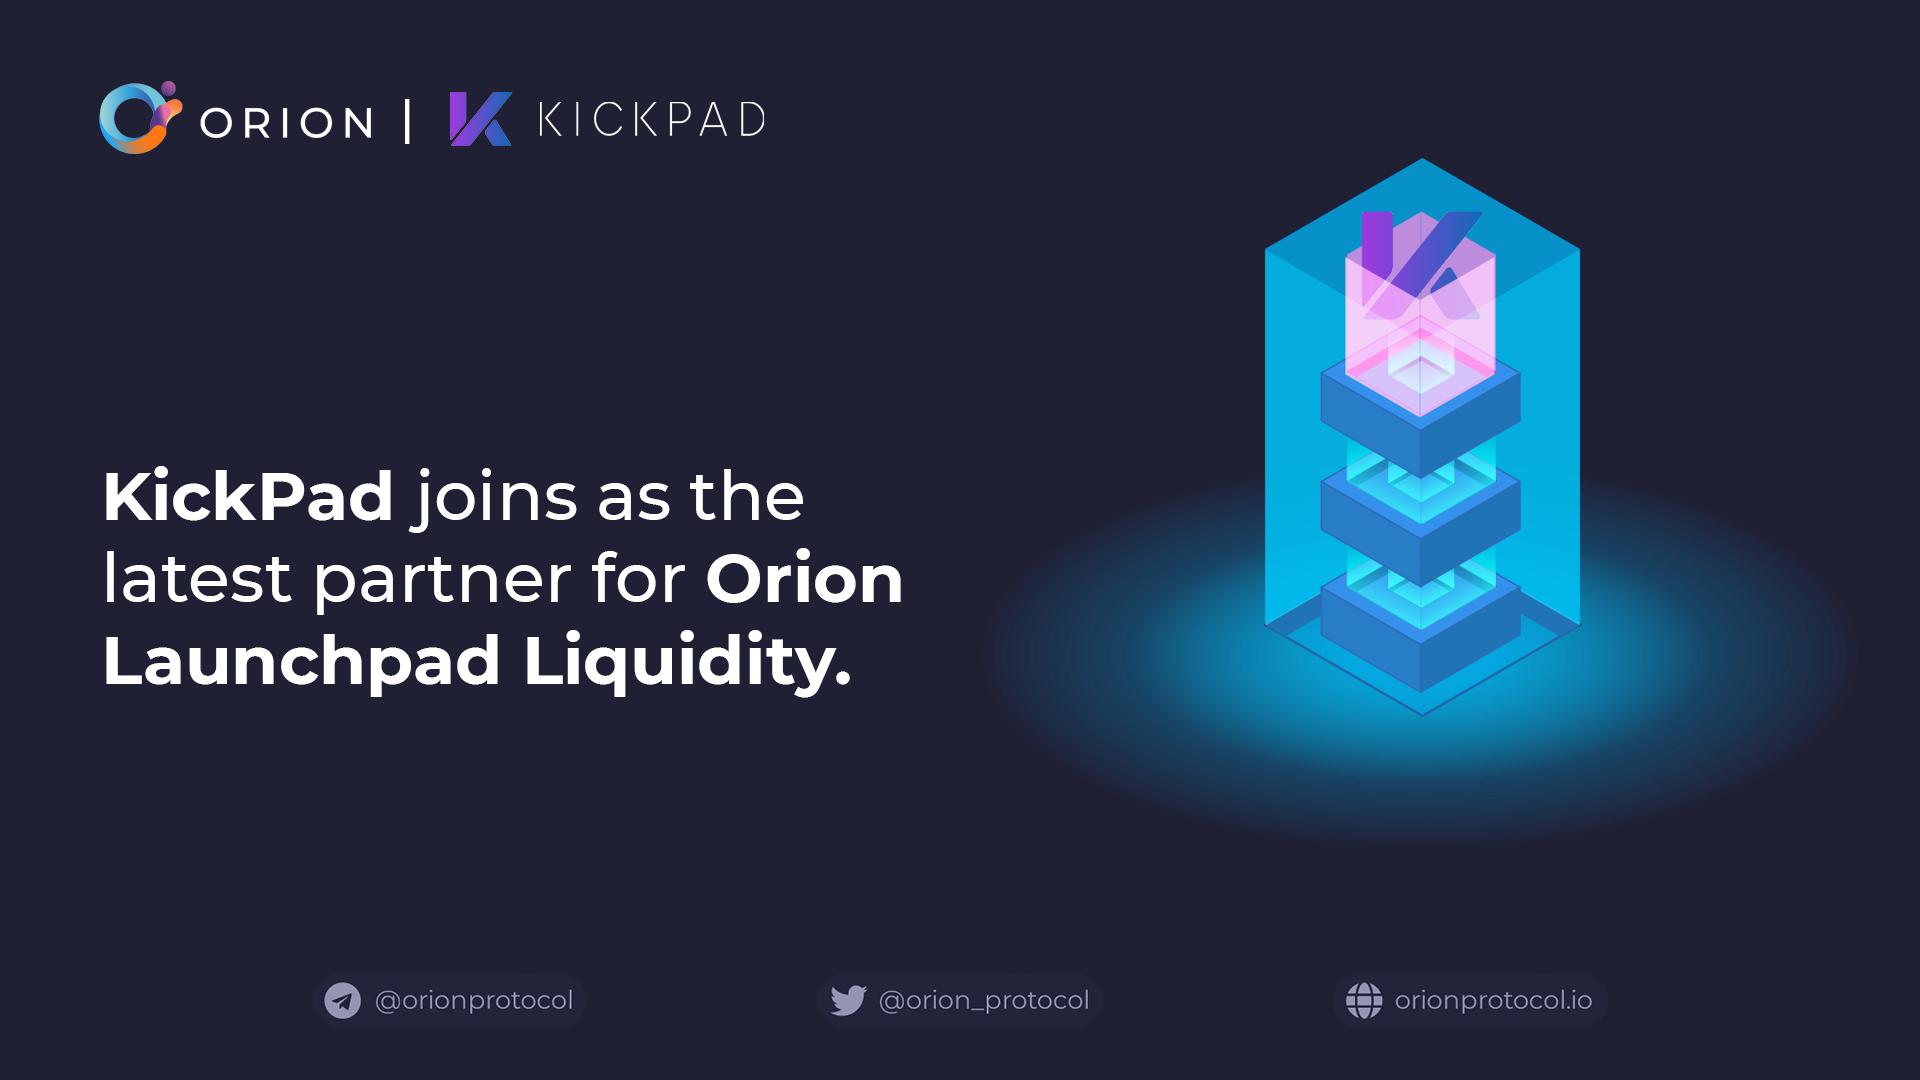 KickPAD joins as Launchpad Liquidity partner